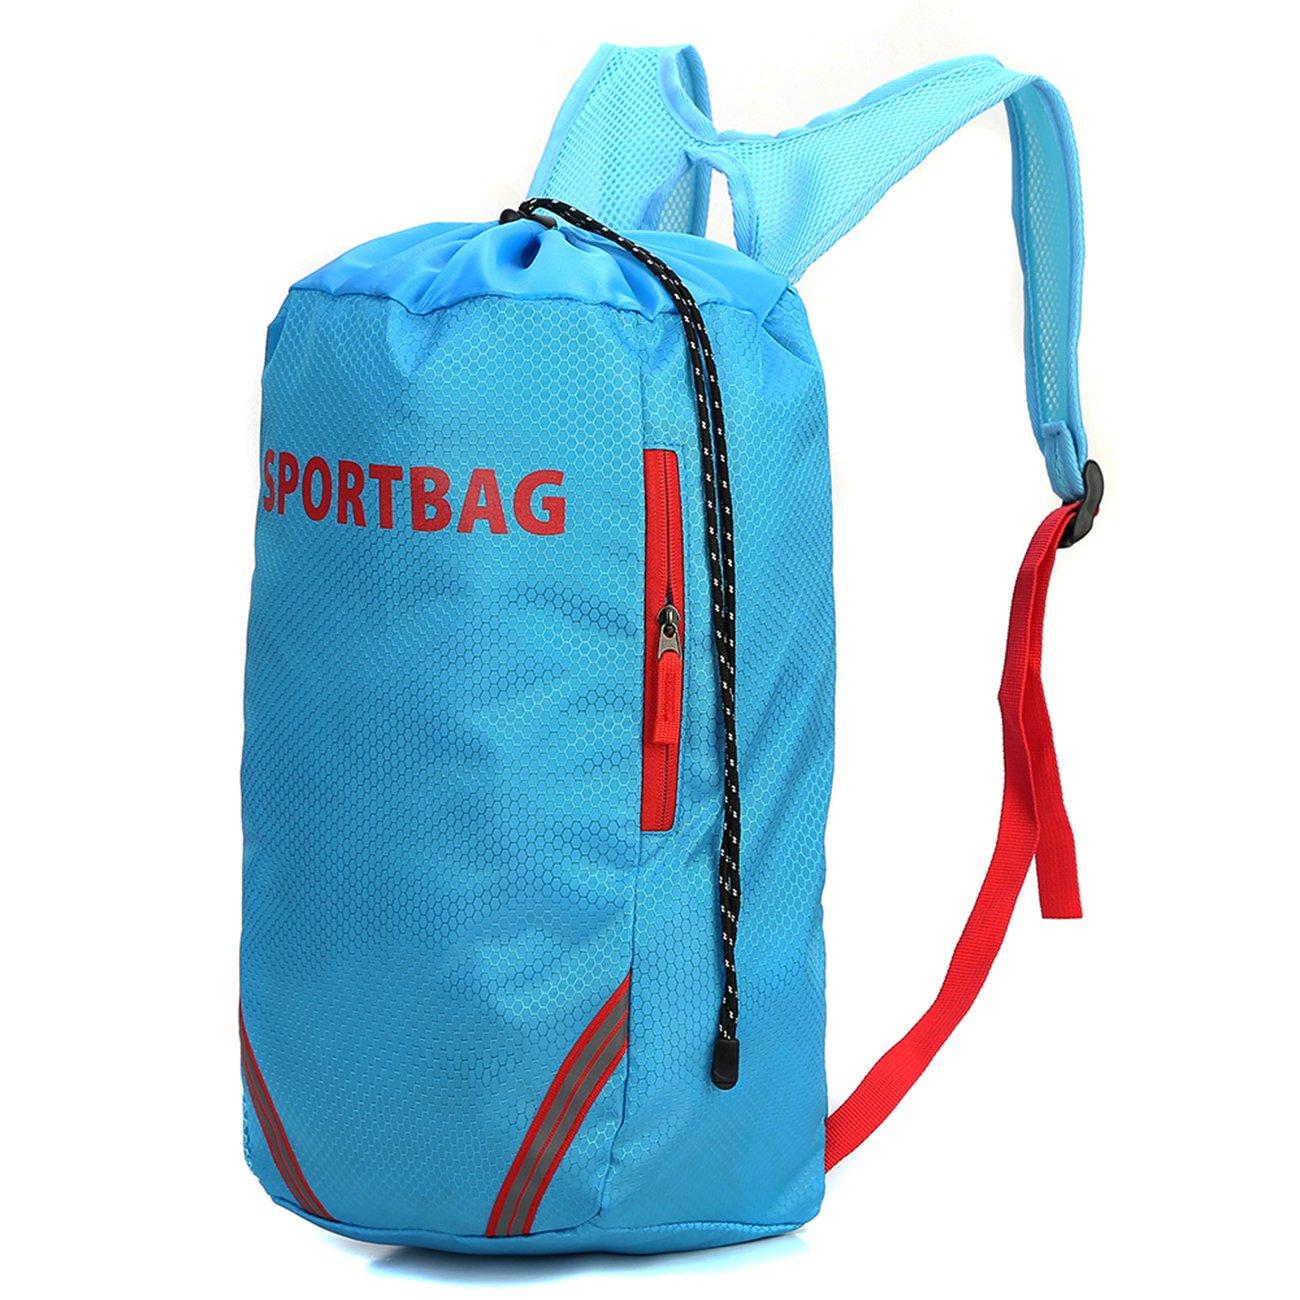 YU XIN Drawstring Backpack Waterproof Gym Bag Gym sack for Men Women and Students, Lightweight Sports Bag Kids School PE Bag Blue